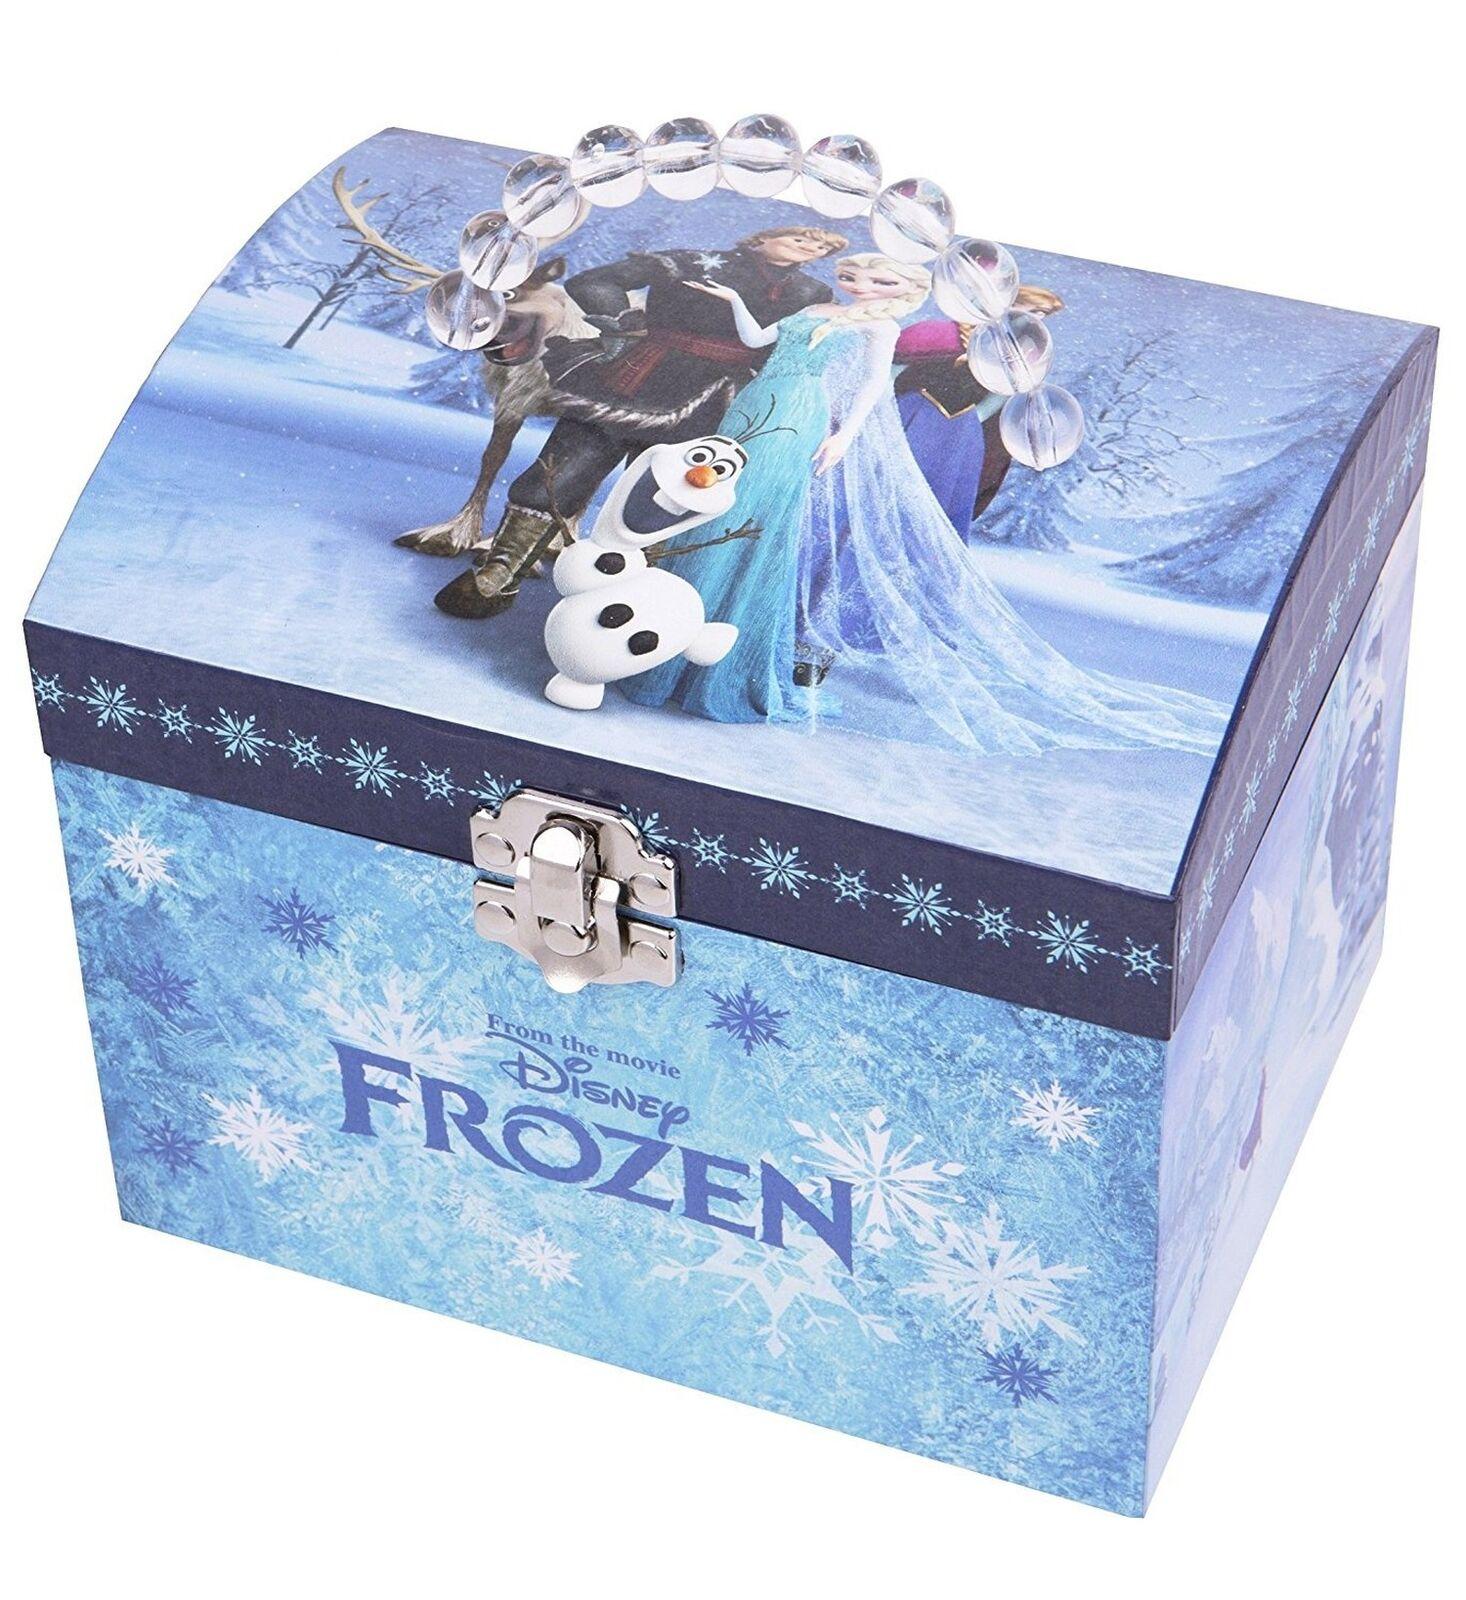 Trousselier Music Frozen Elsa Vanity Case